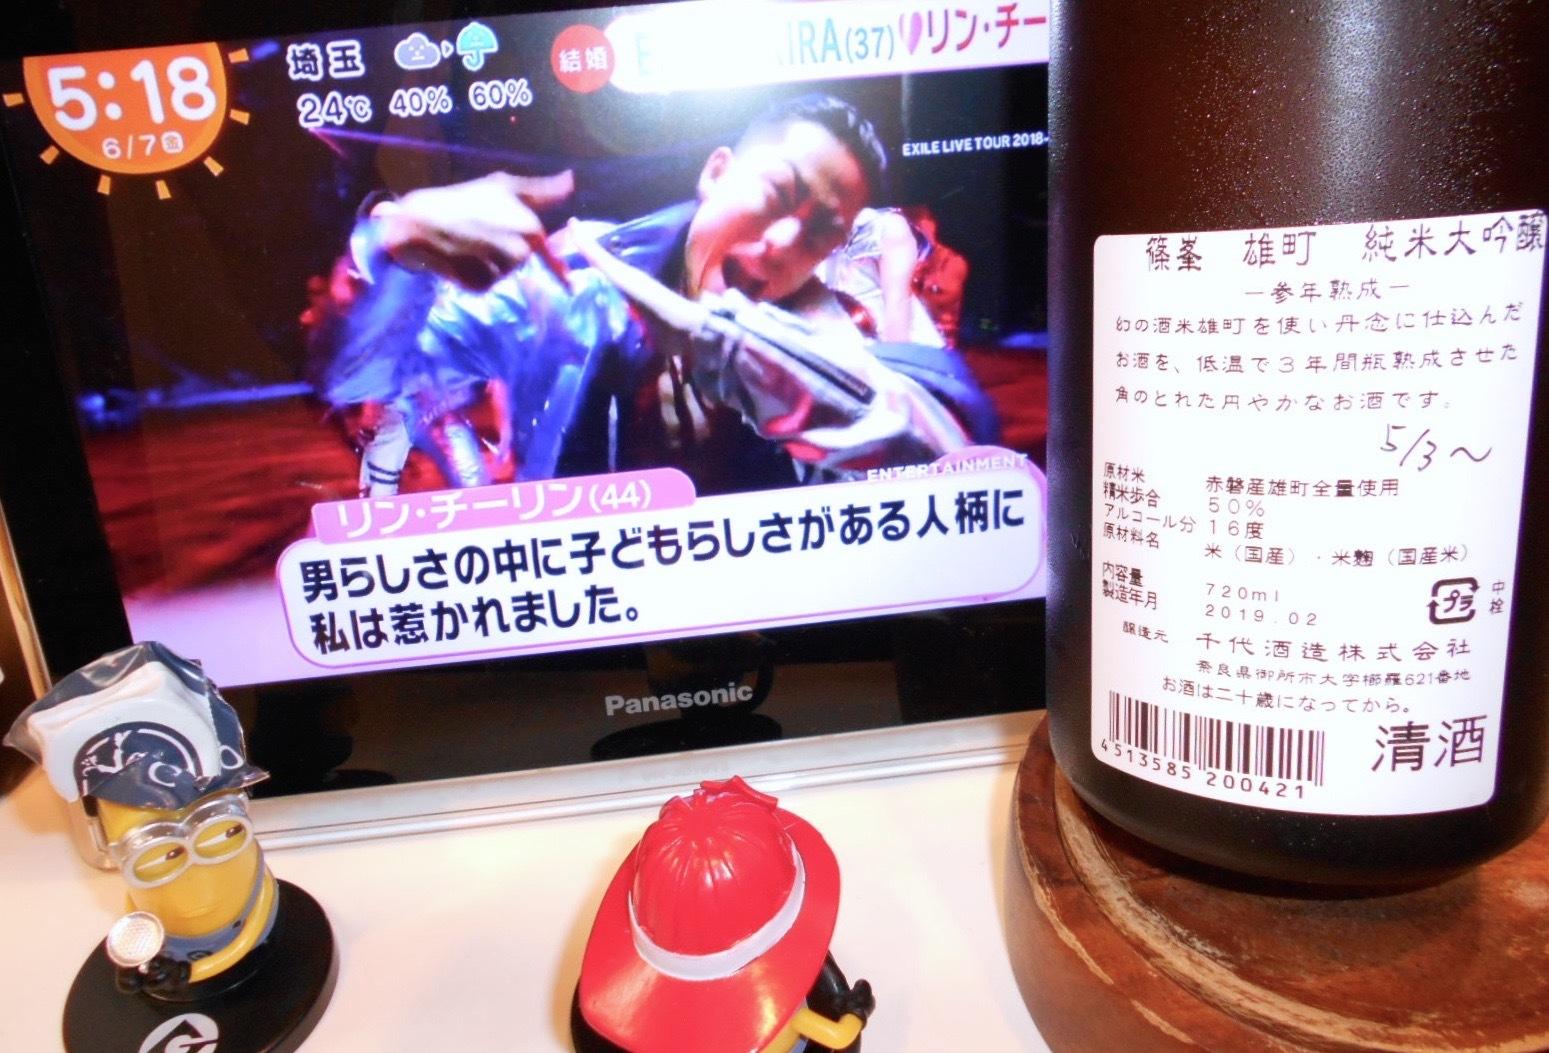 shinomine_jundai_omachi_sannen27by1_2.jpg